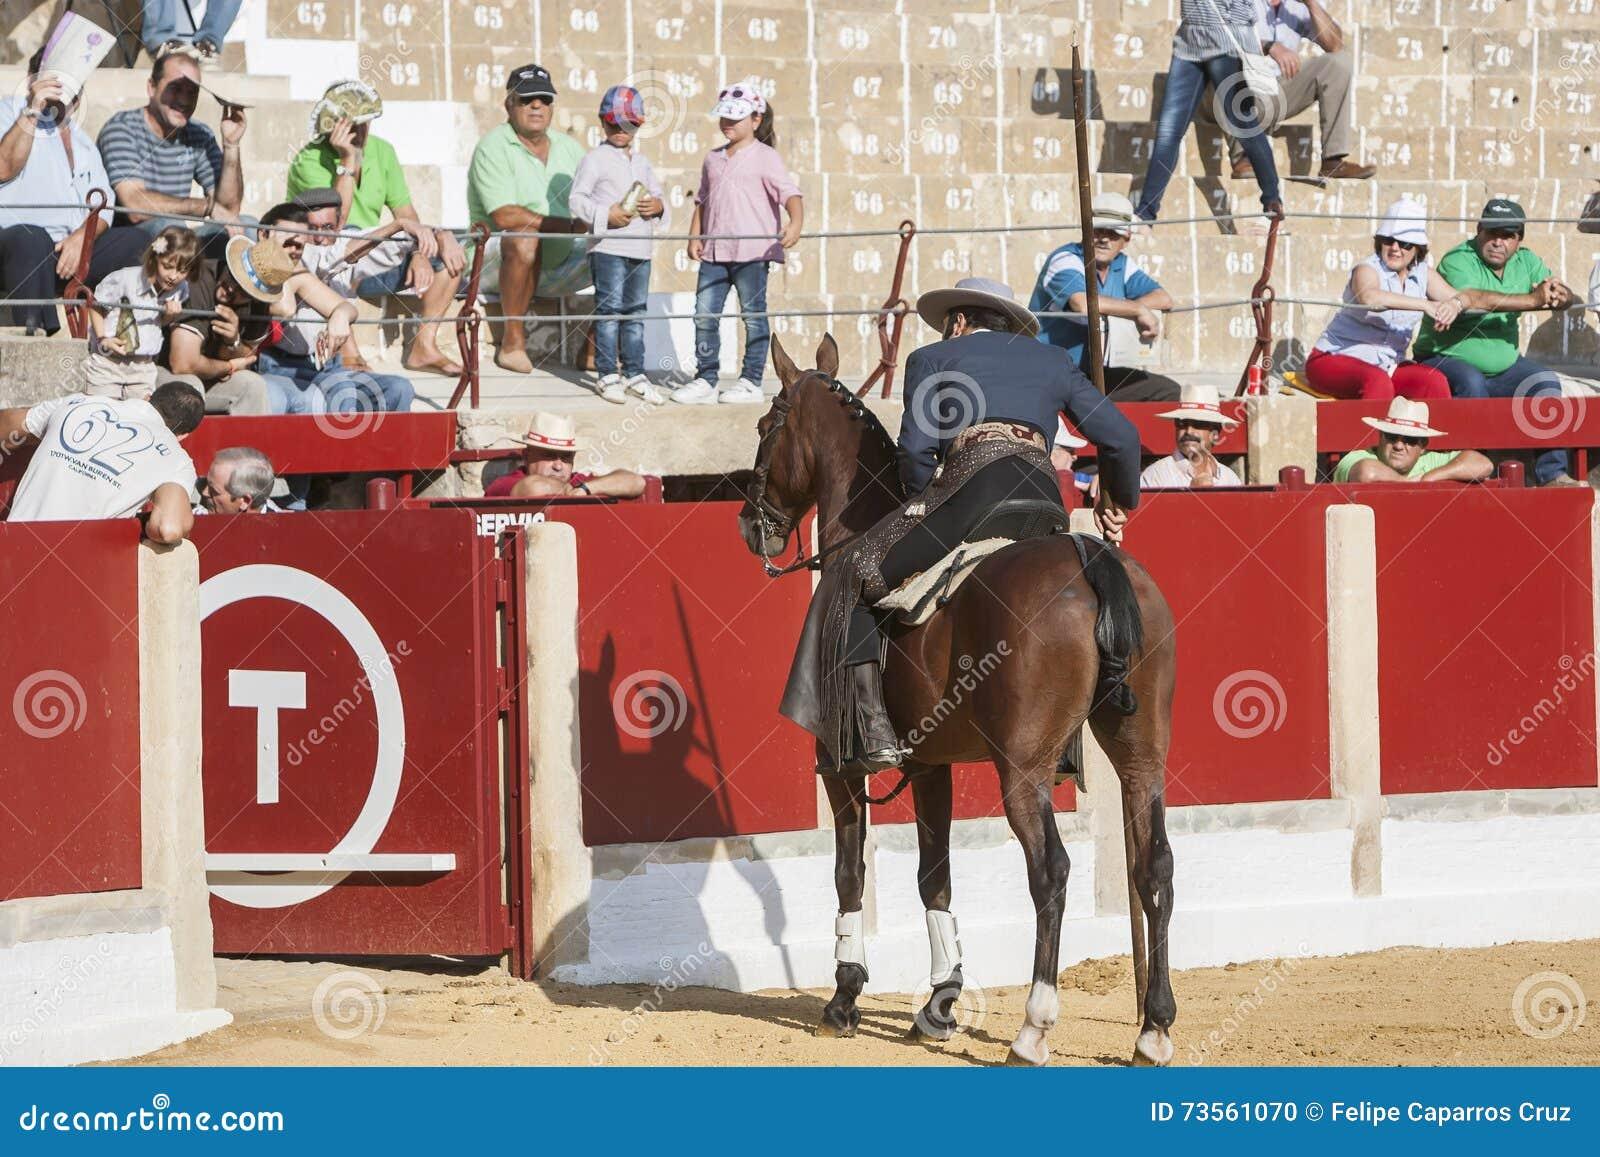 Alvaro Montes, ταυρομάχος στο ισπανικό garrocha μαγισσών πλατών αλόγου (